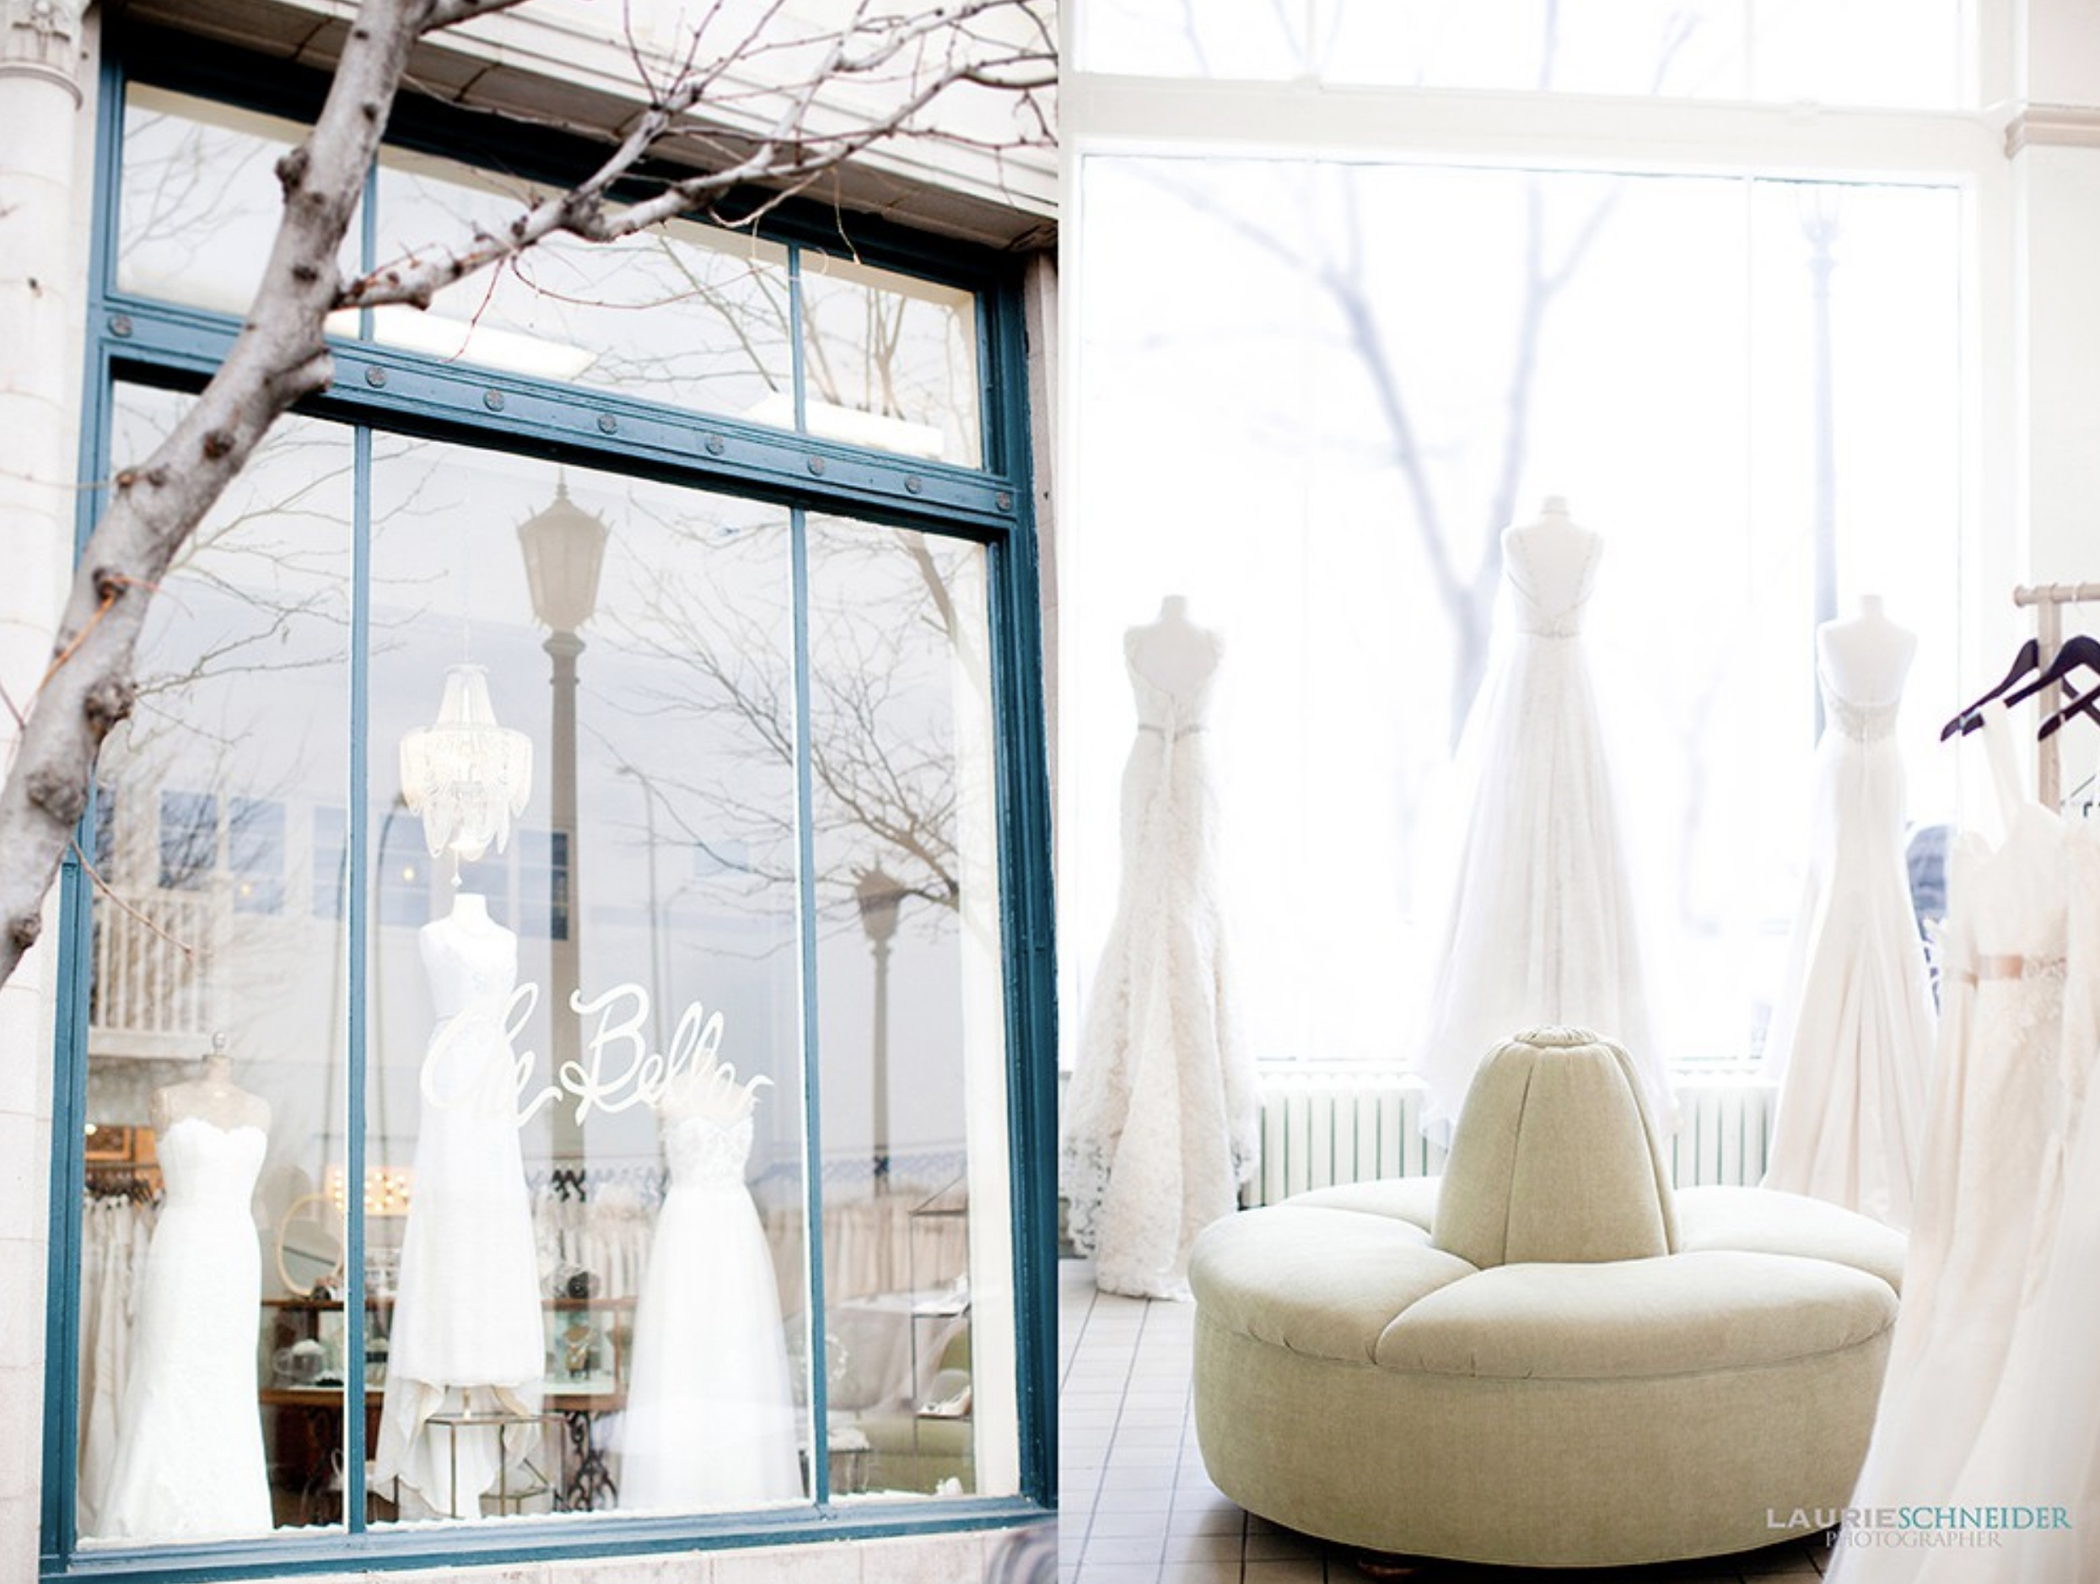 Editorial photography chebella bridal salon minneapolis